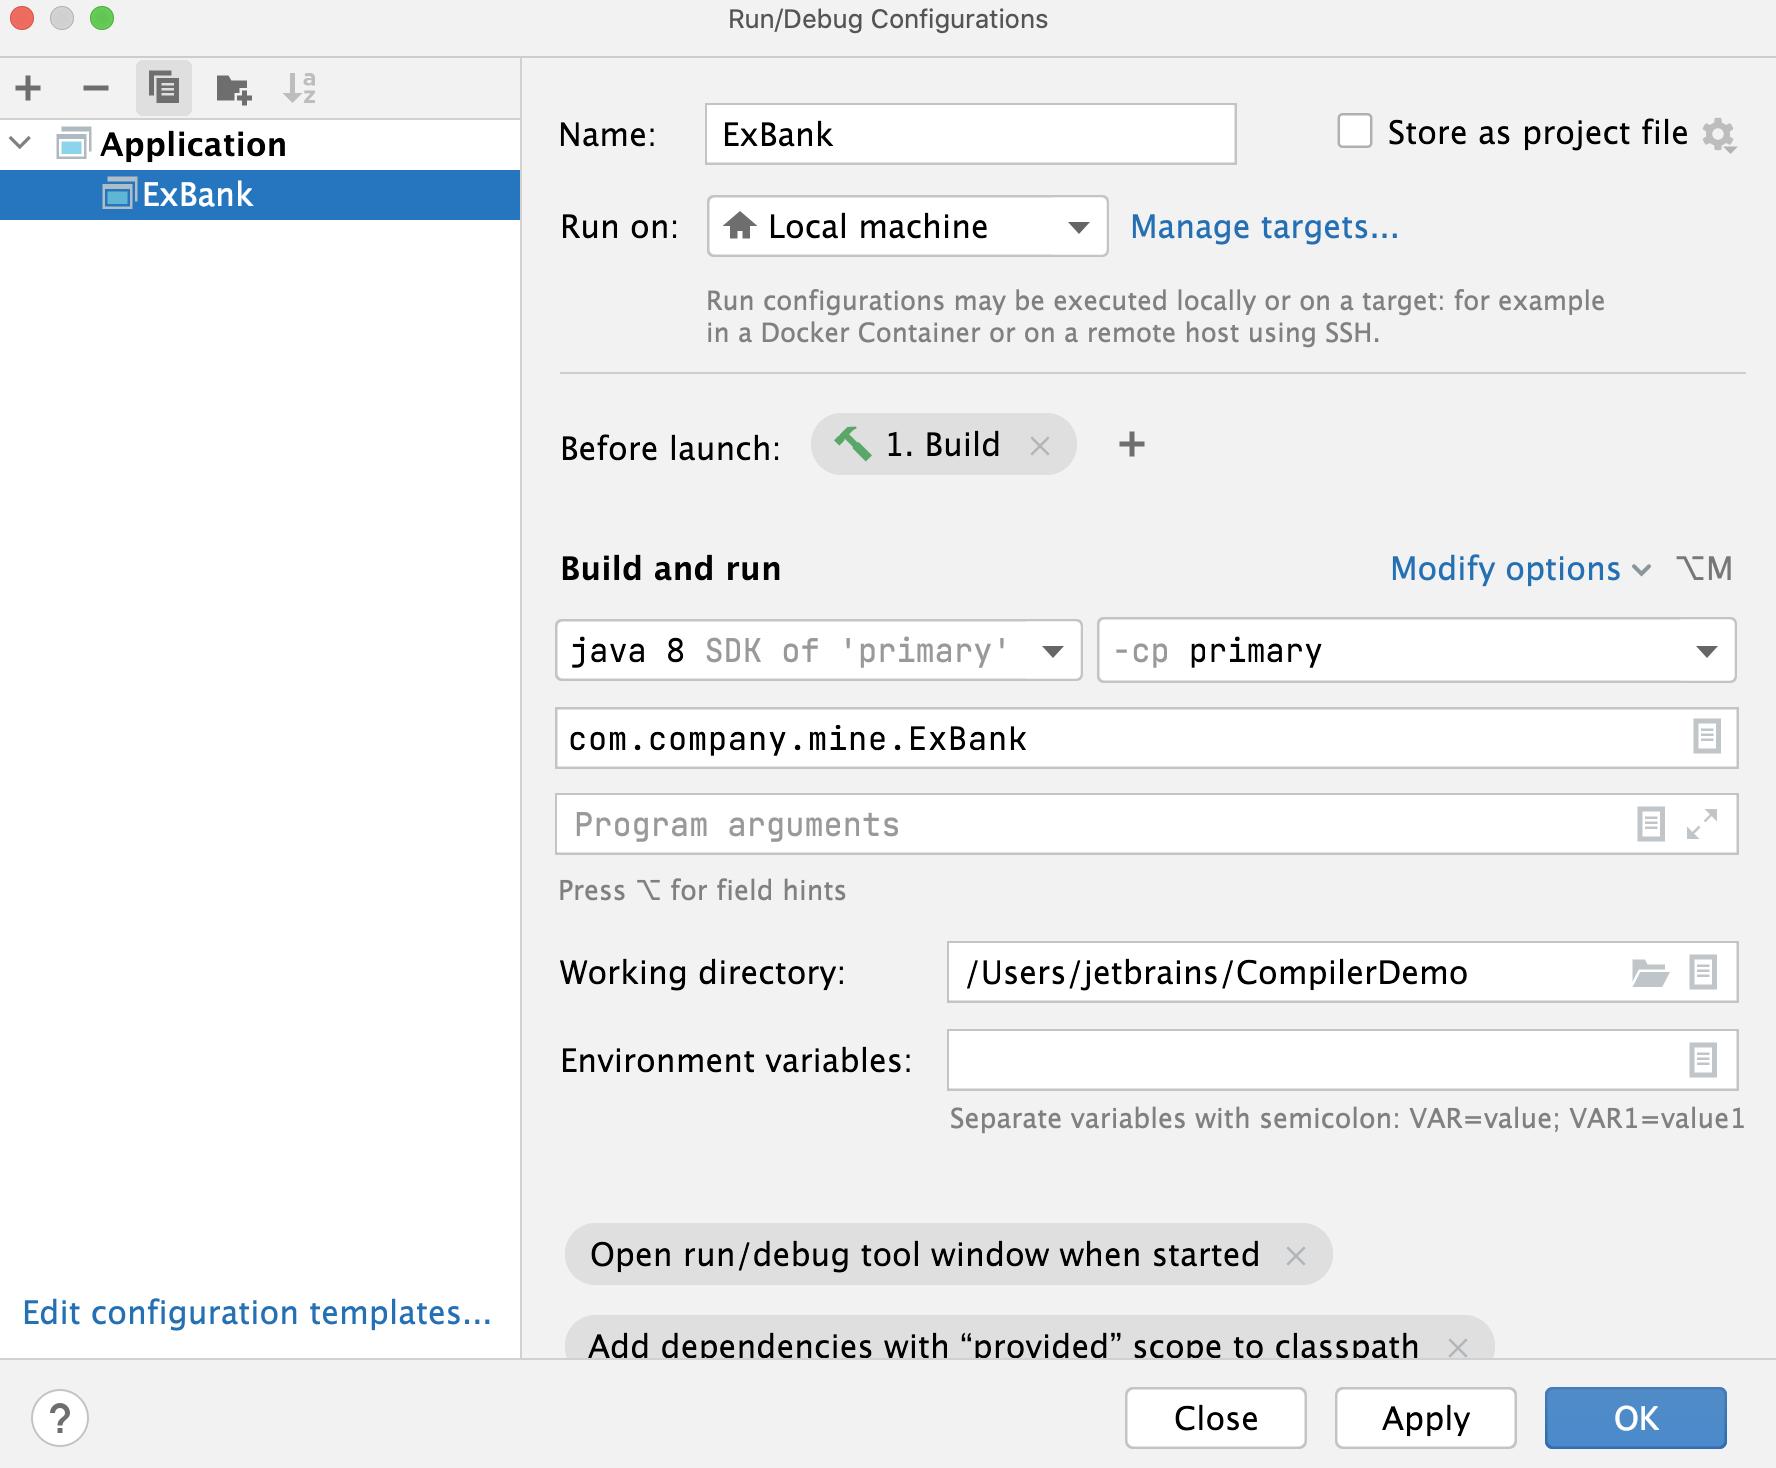 Run/Debug Configuration dialog: Before launch